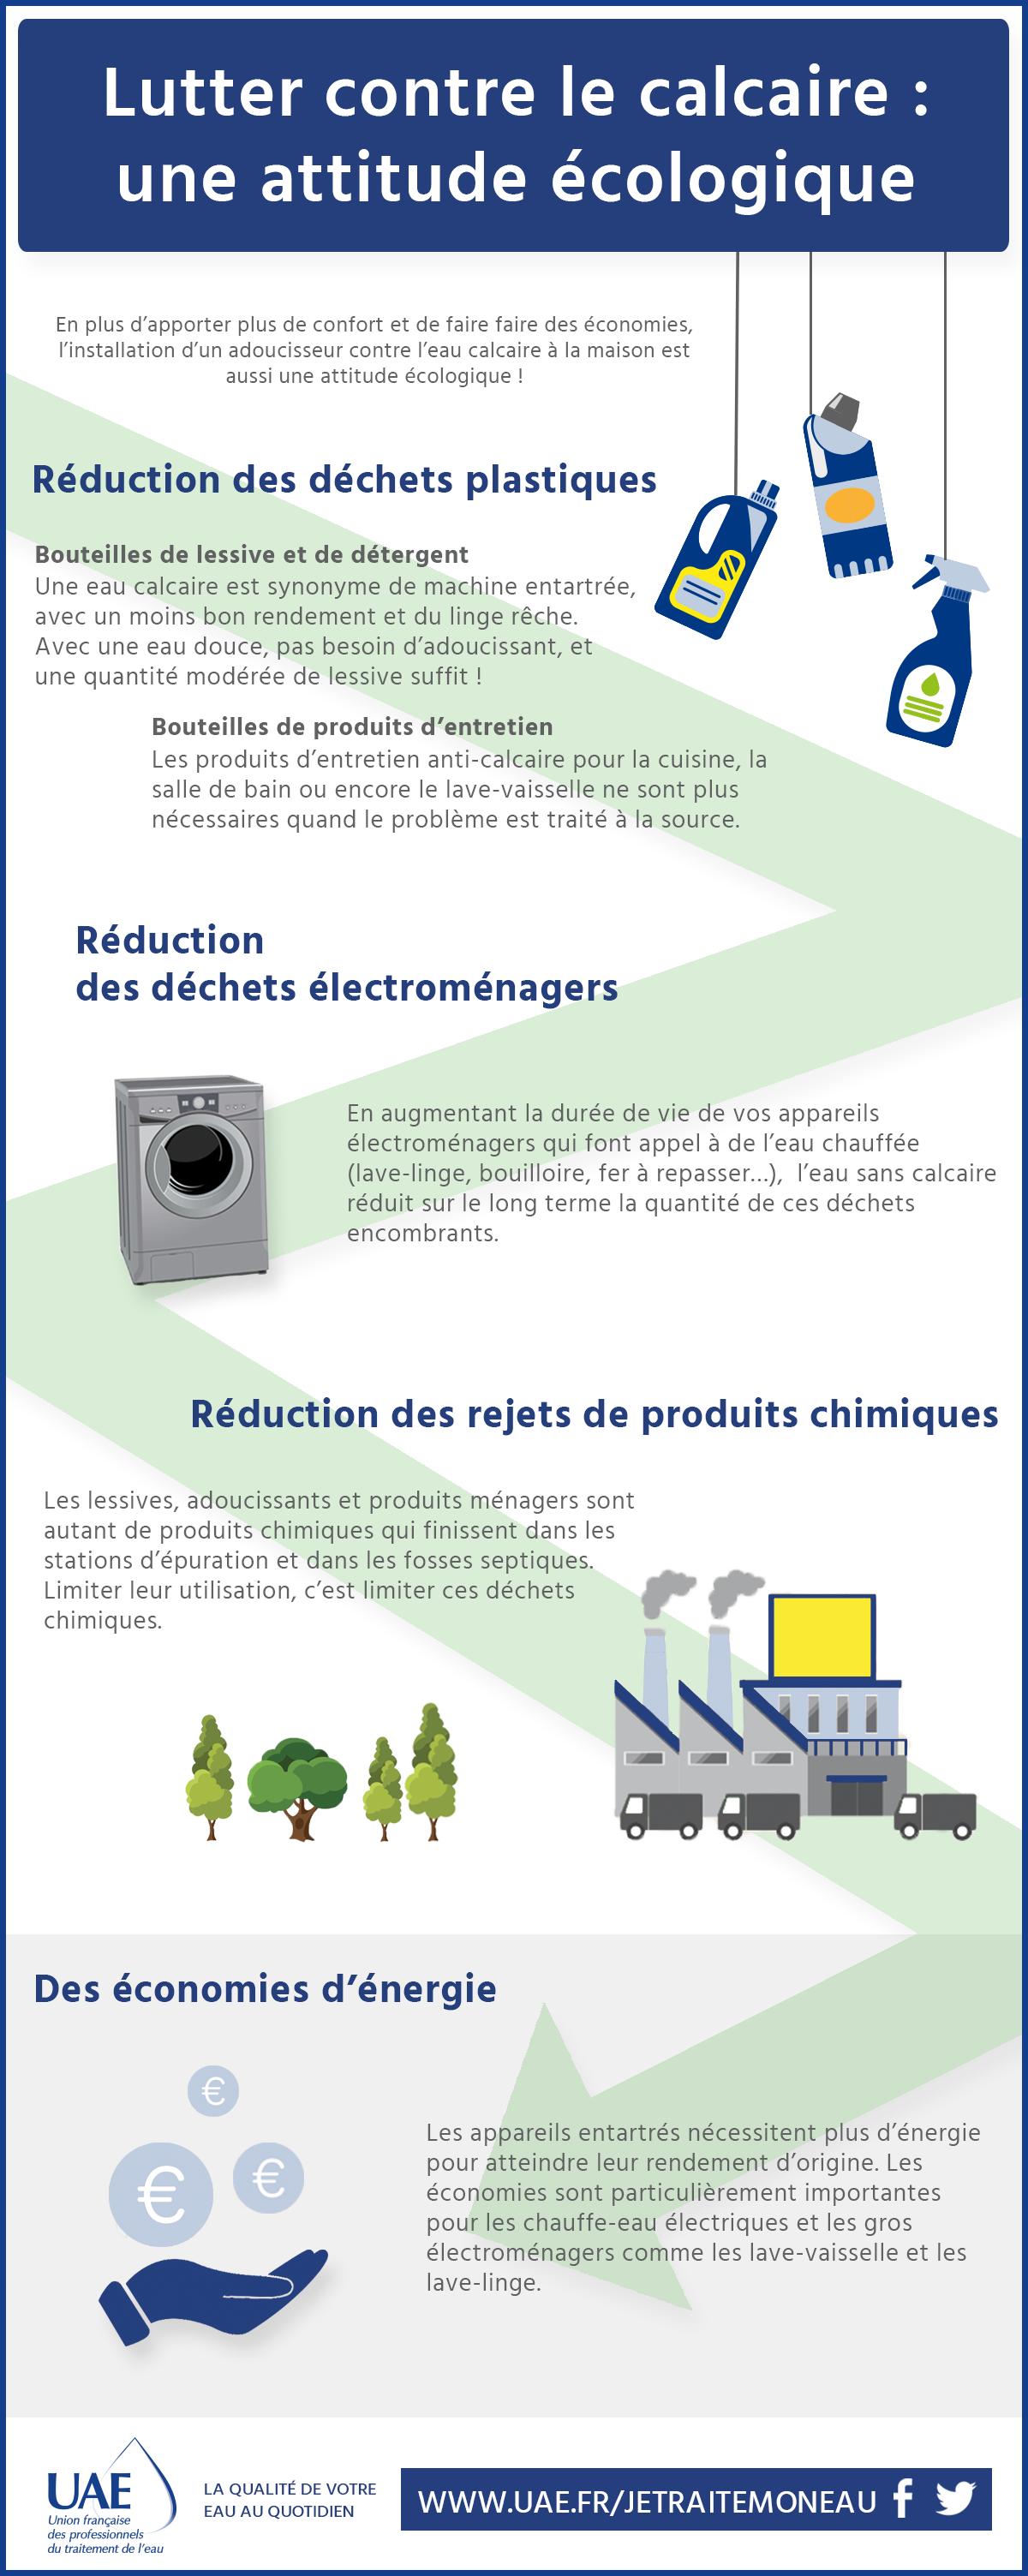 infographie attitude ecologique